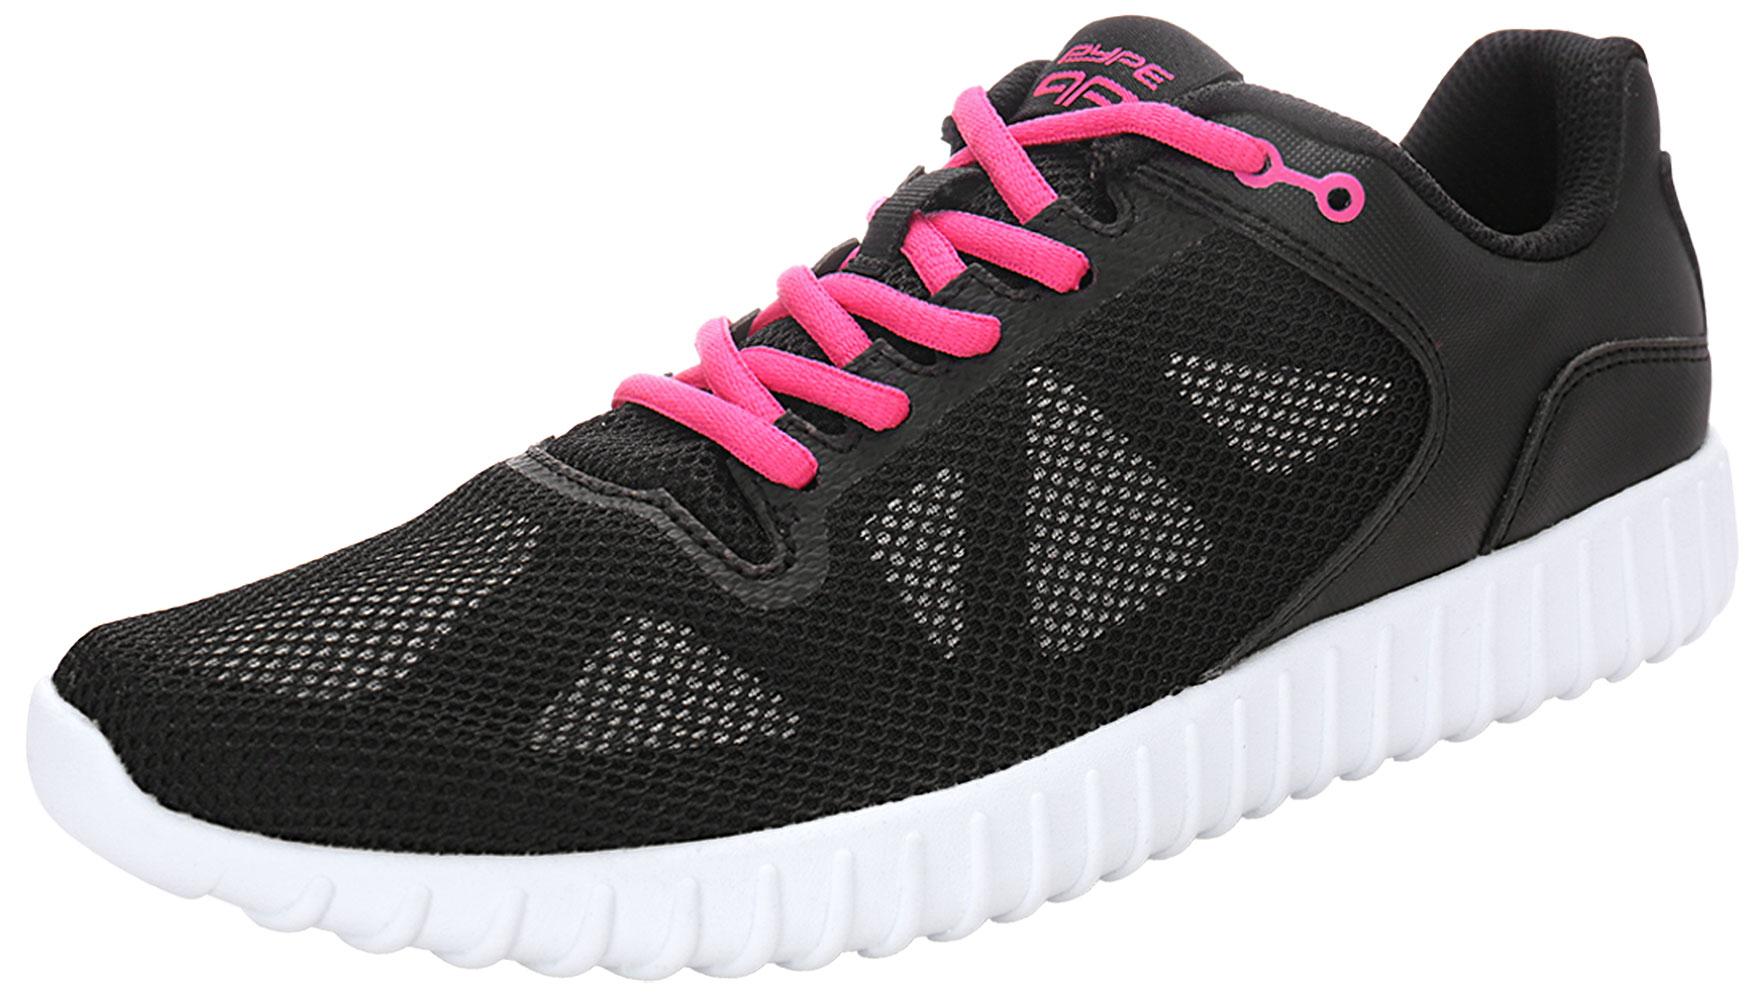 PYPE Women Geometric Prints Lace Up Mesh Training Shoes Black US 10